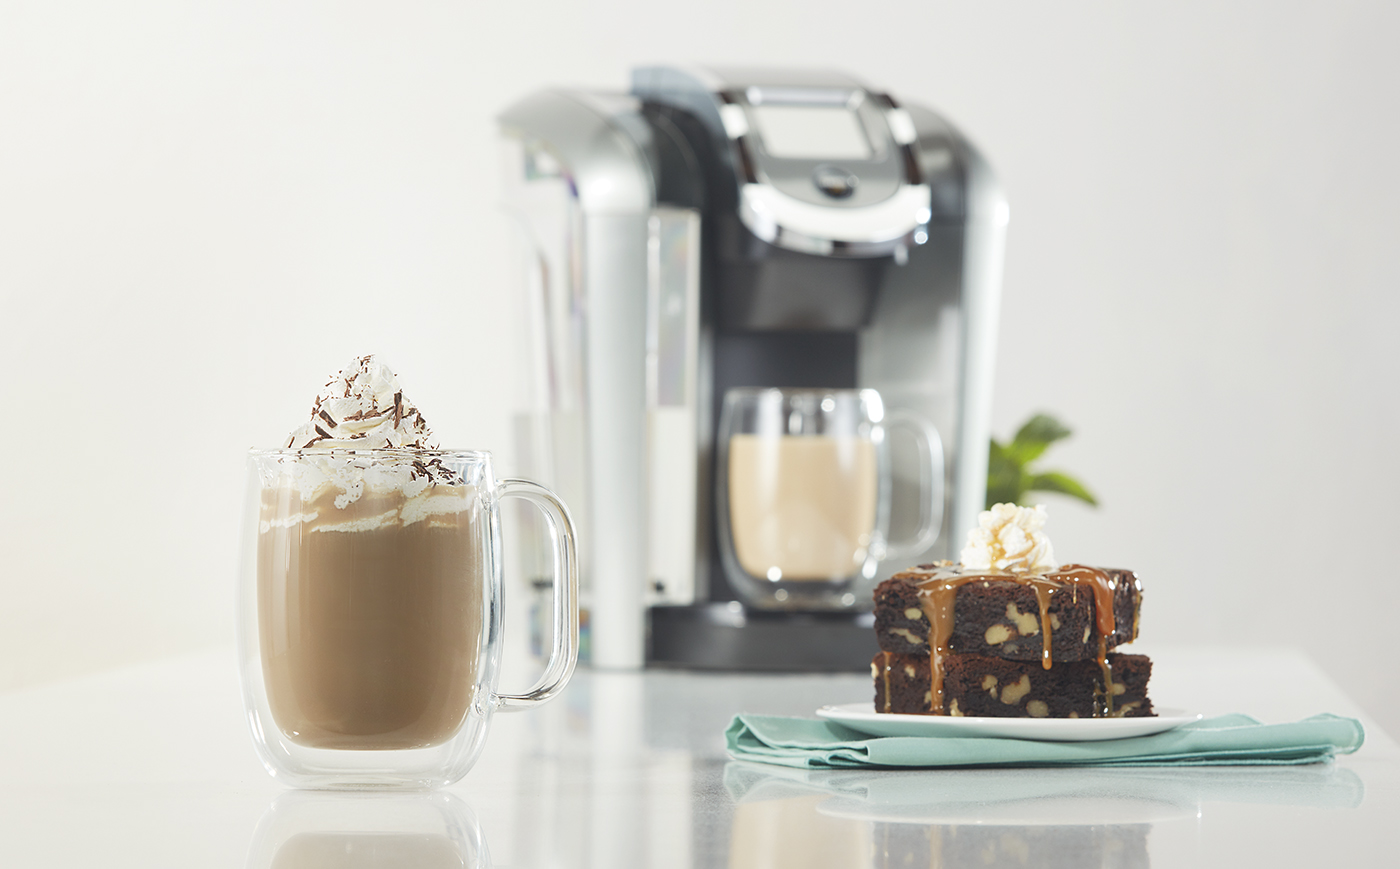 Geoff_Cardin_gourmetcoffee.jpg